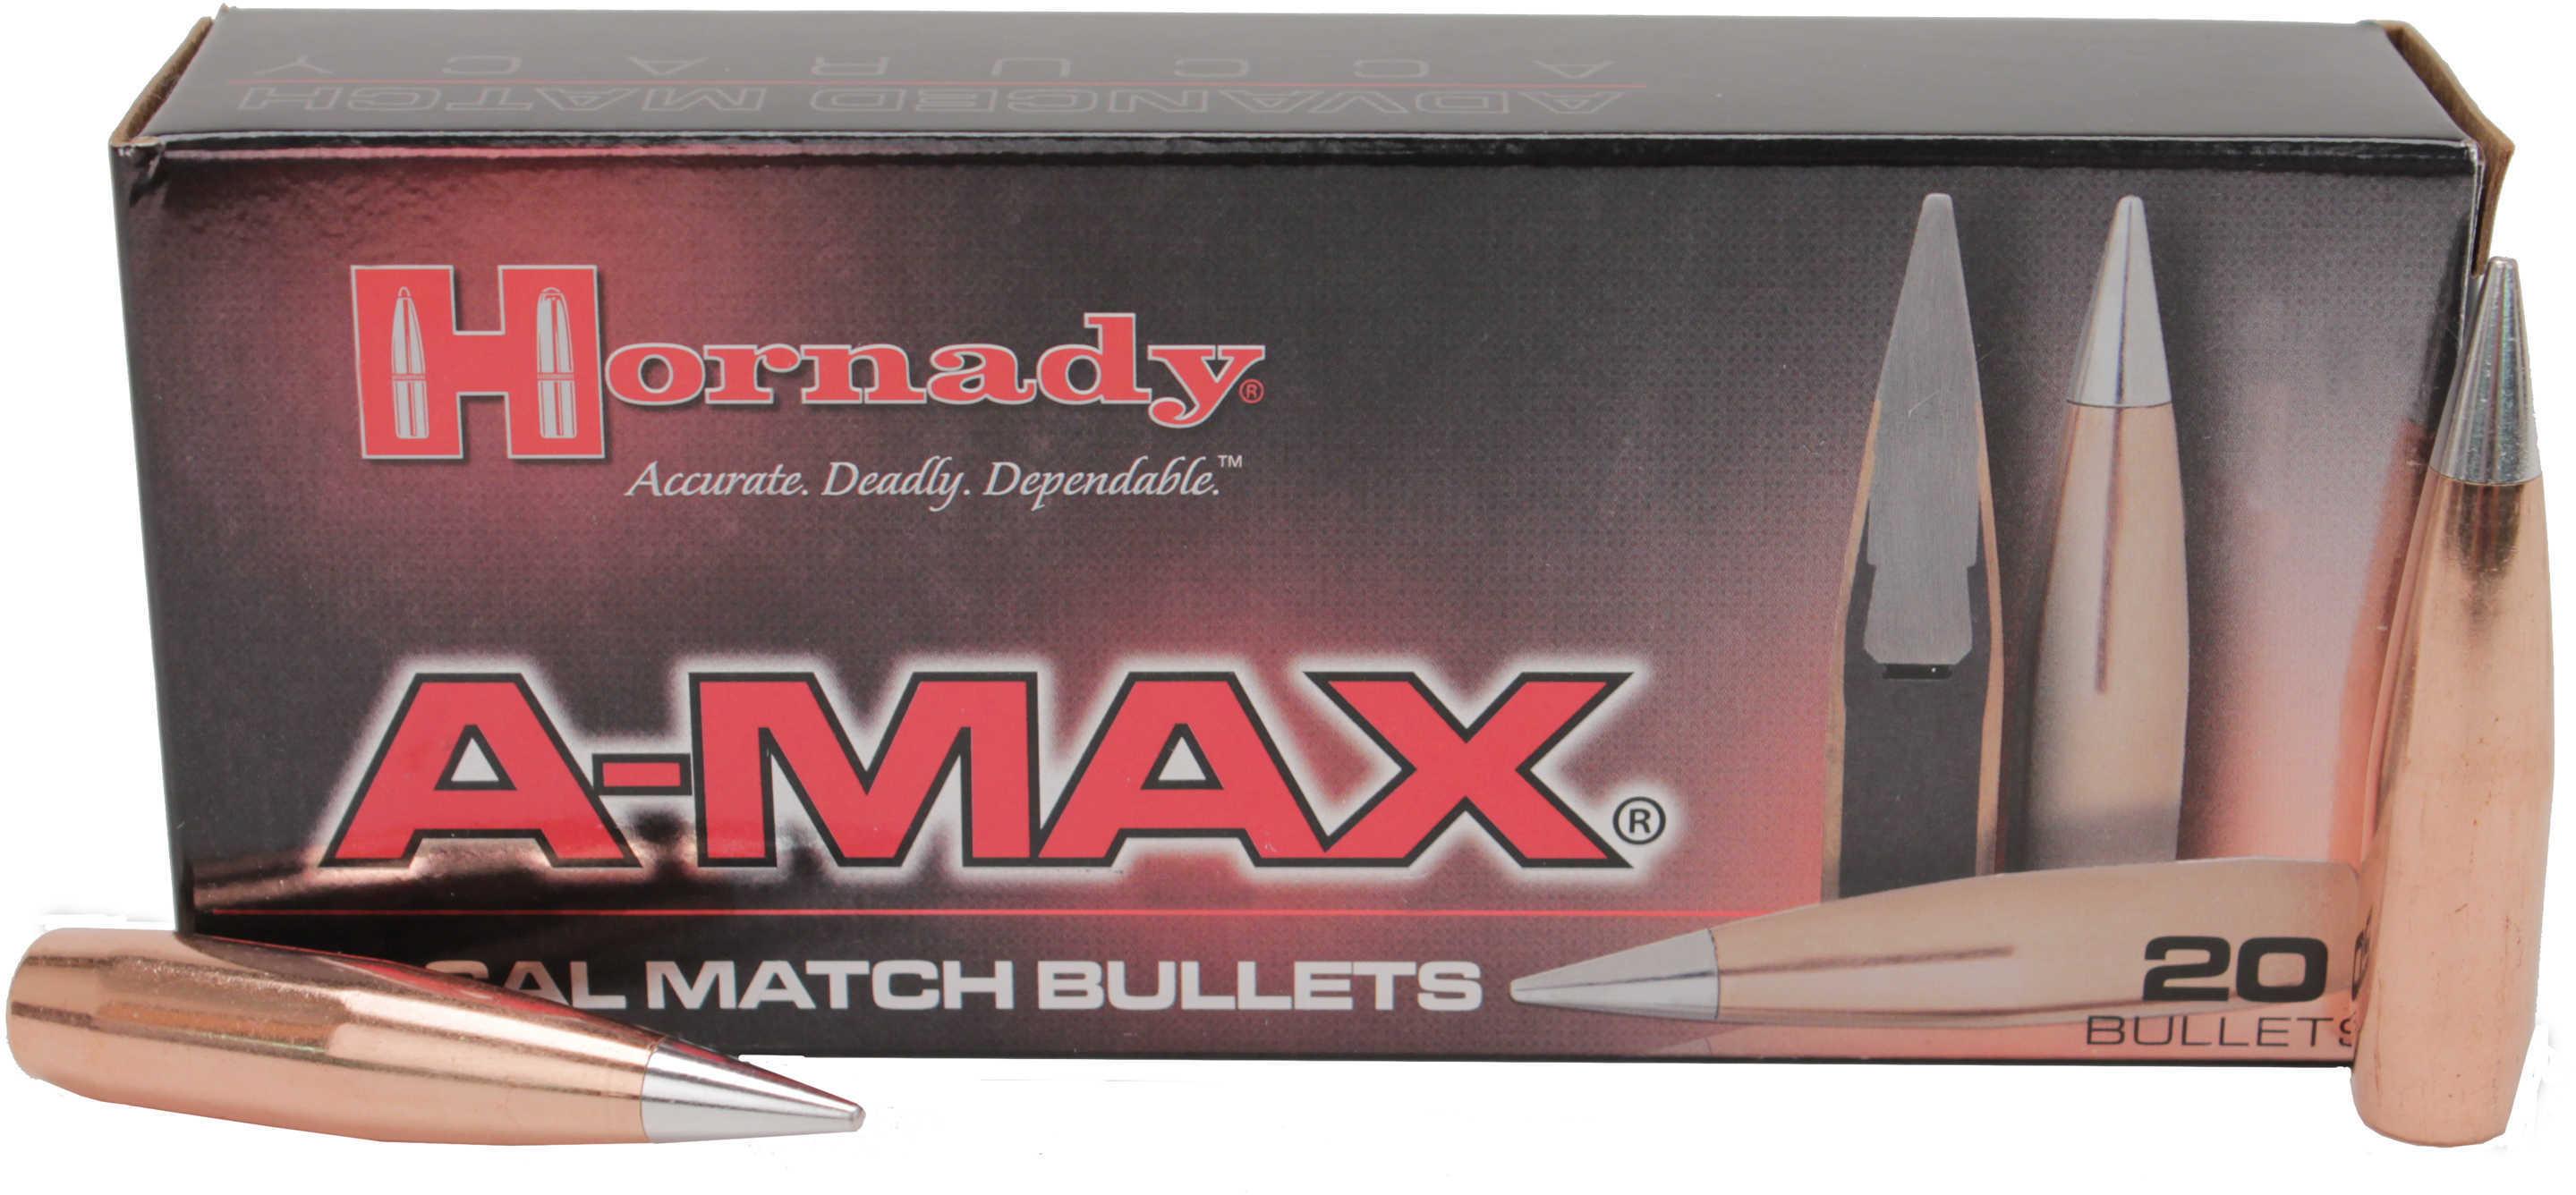 Hornady A-Max BMG 50 Caliber 750 Grain Boat Tail Component Bullets, 20 Per Box